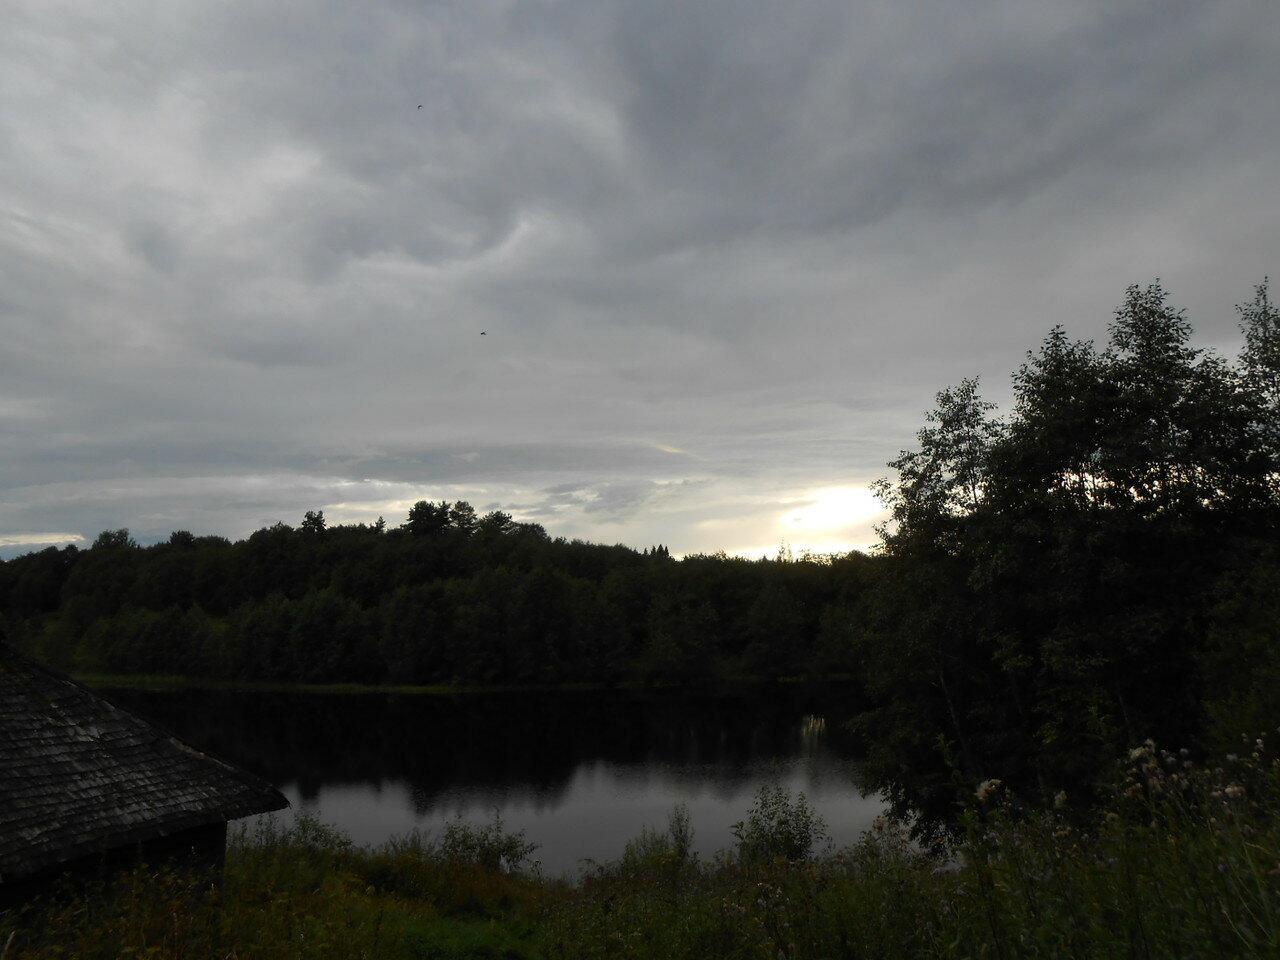 Вид на Байнёвское озеро со стороны деревни Байнёво